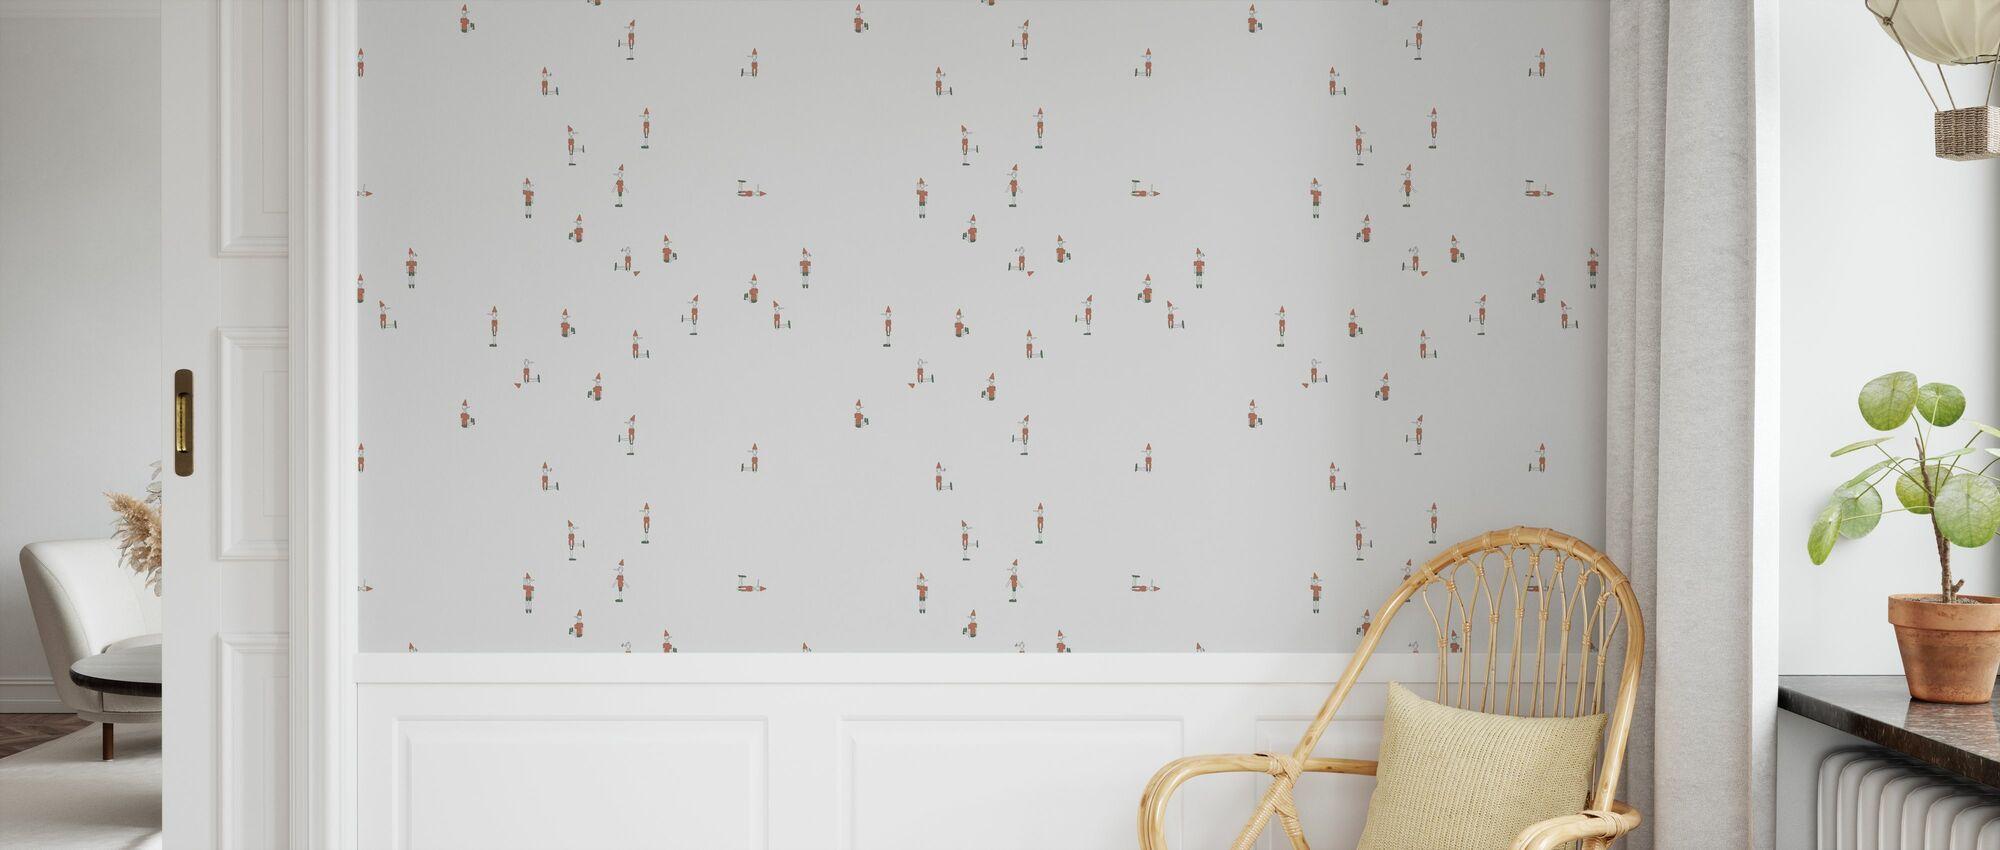 Pinocchio - Wallpaper - Kids Room